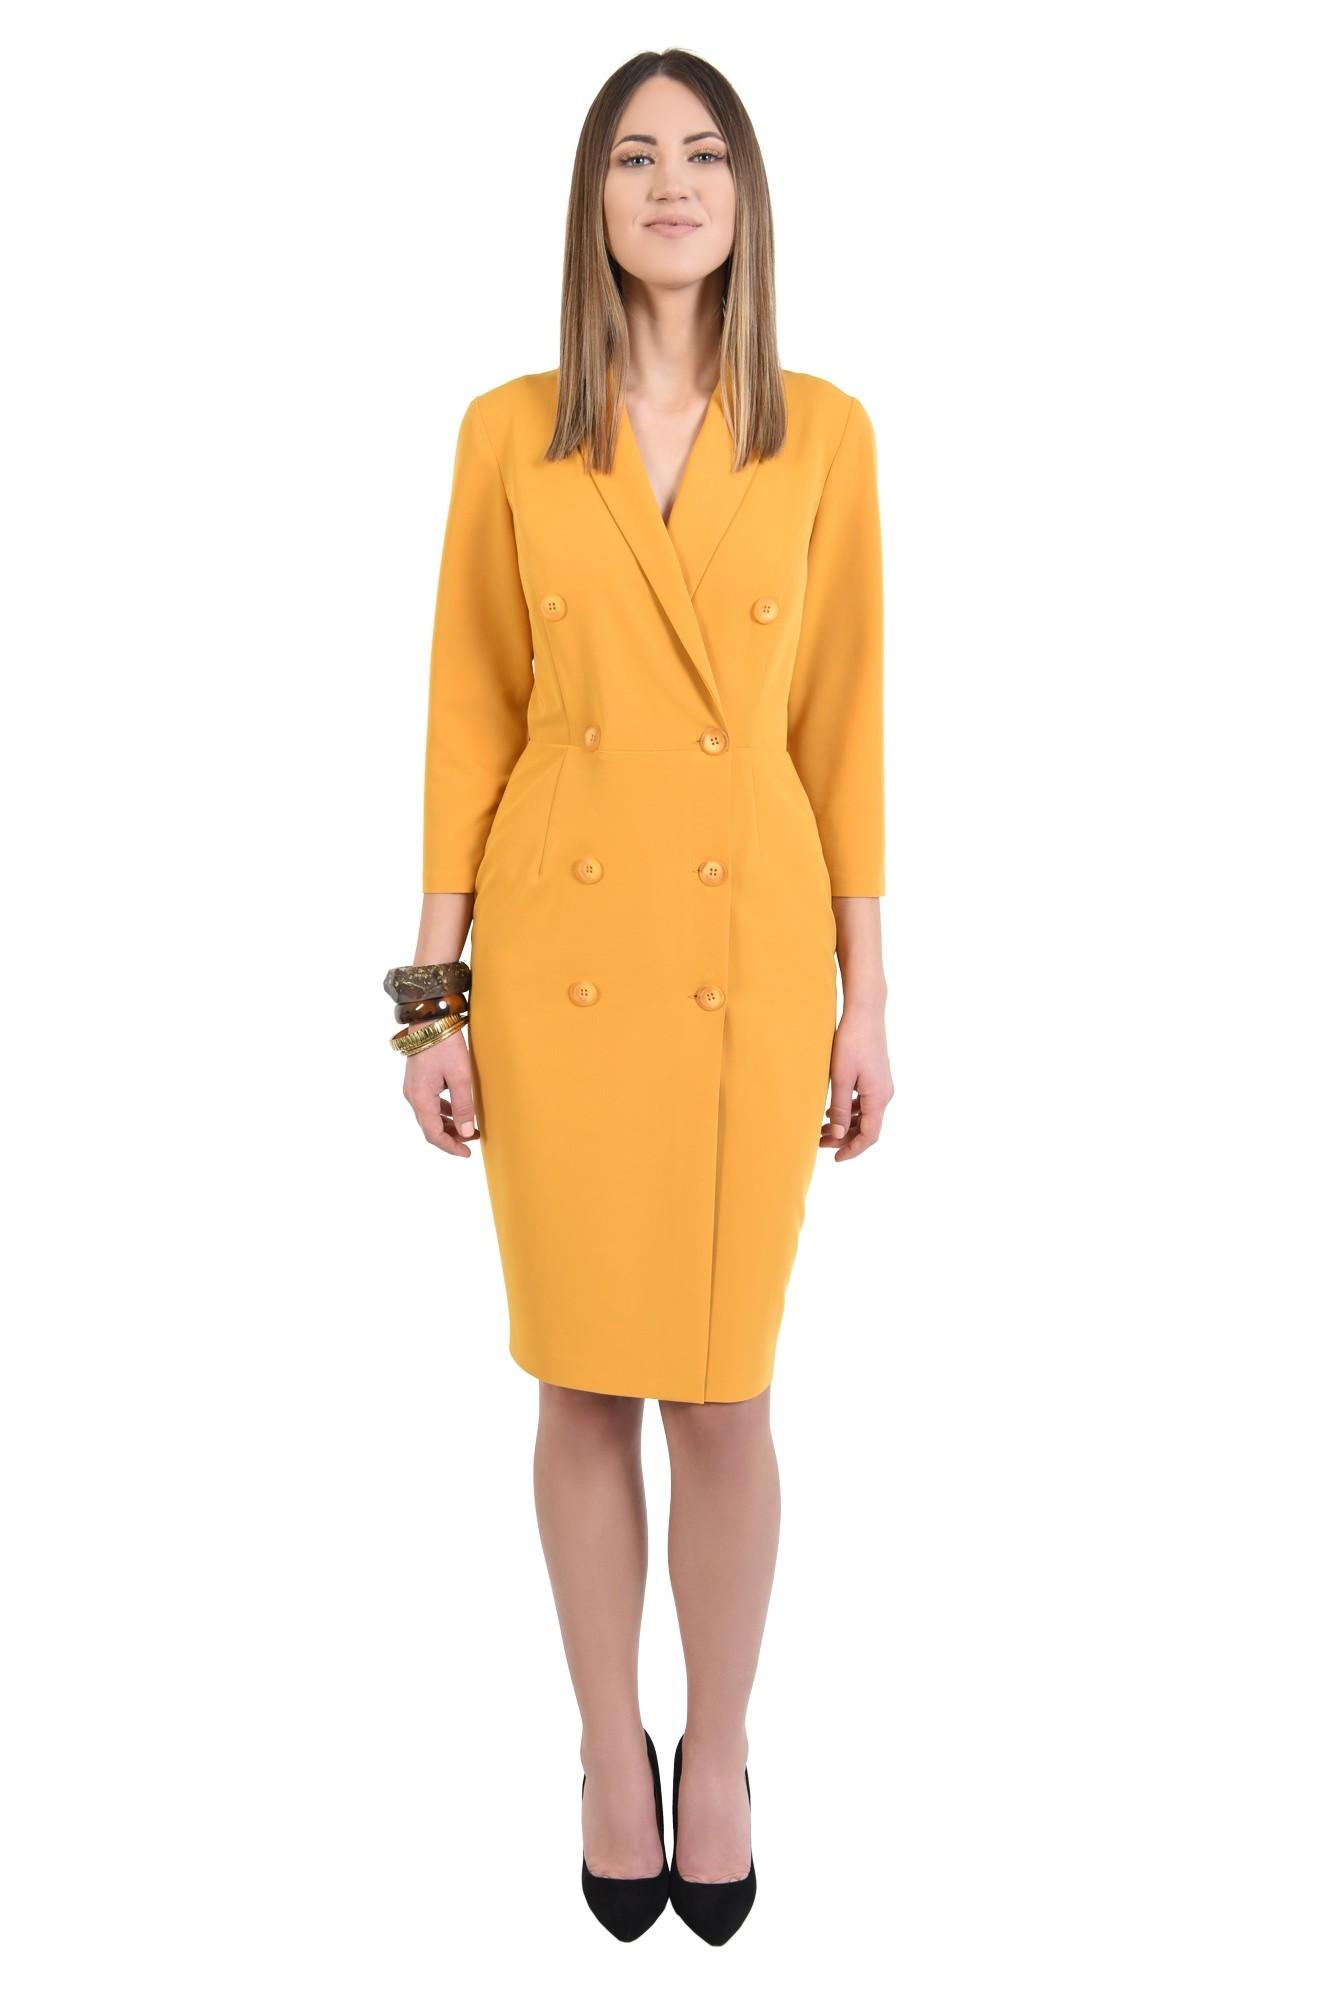 360 - rochie eleganta, conica, midi, galbena, mustar, rochie office